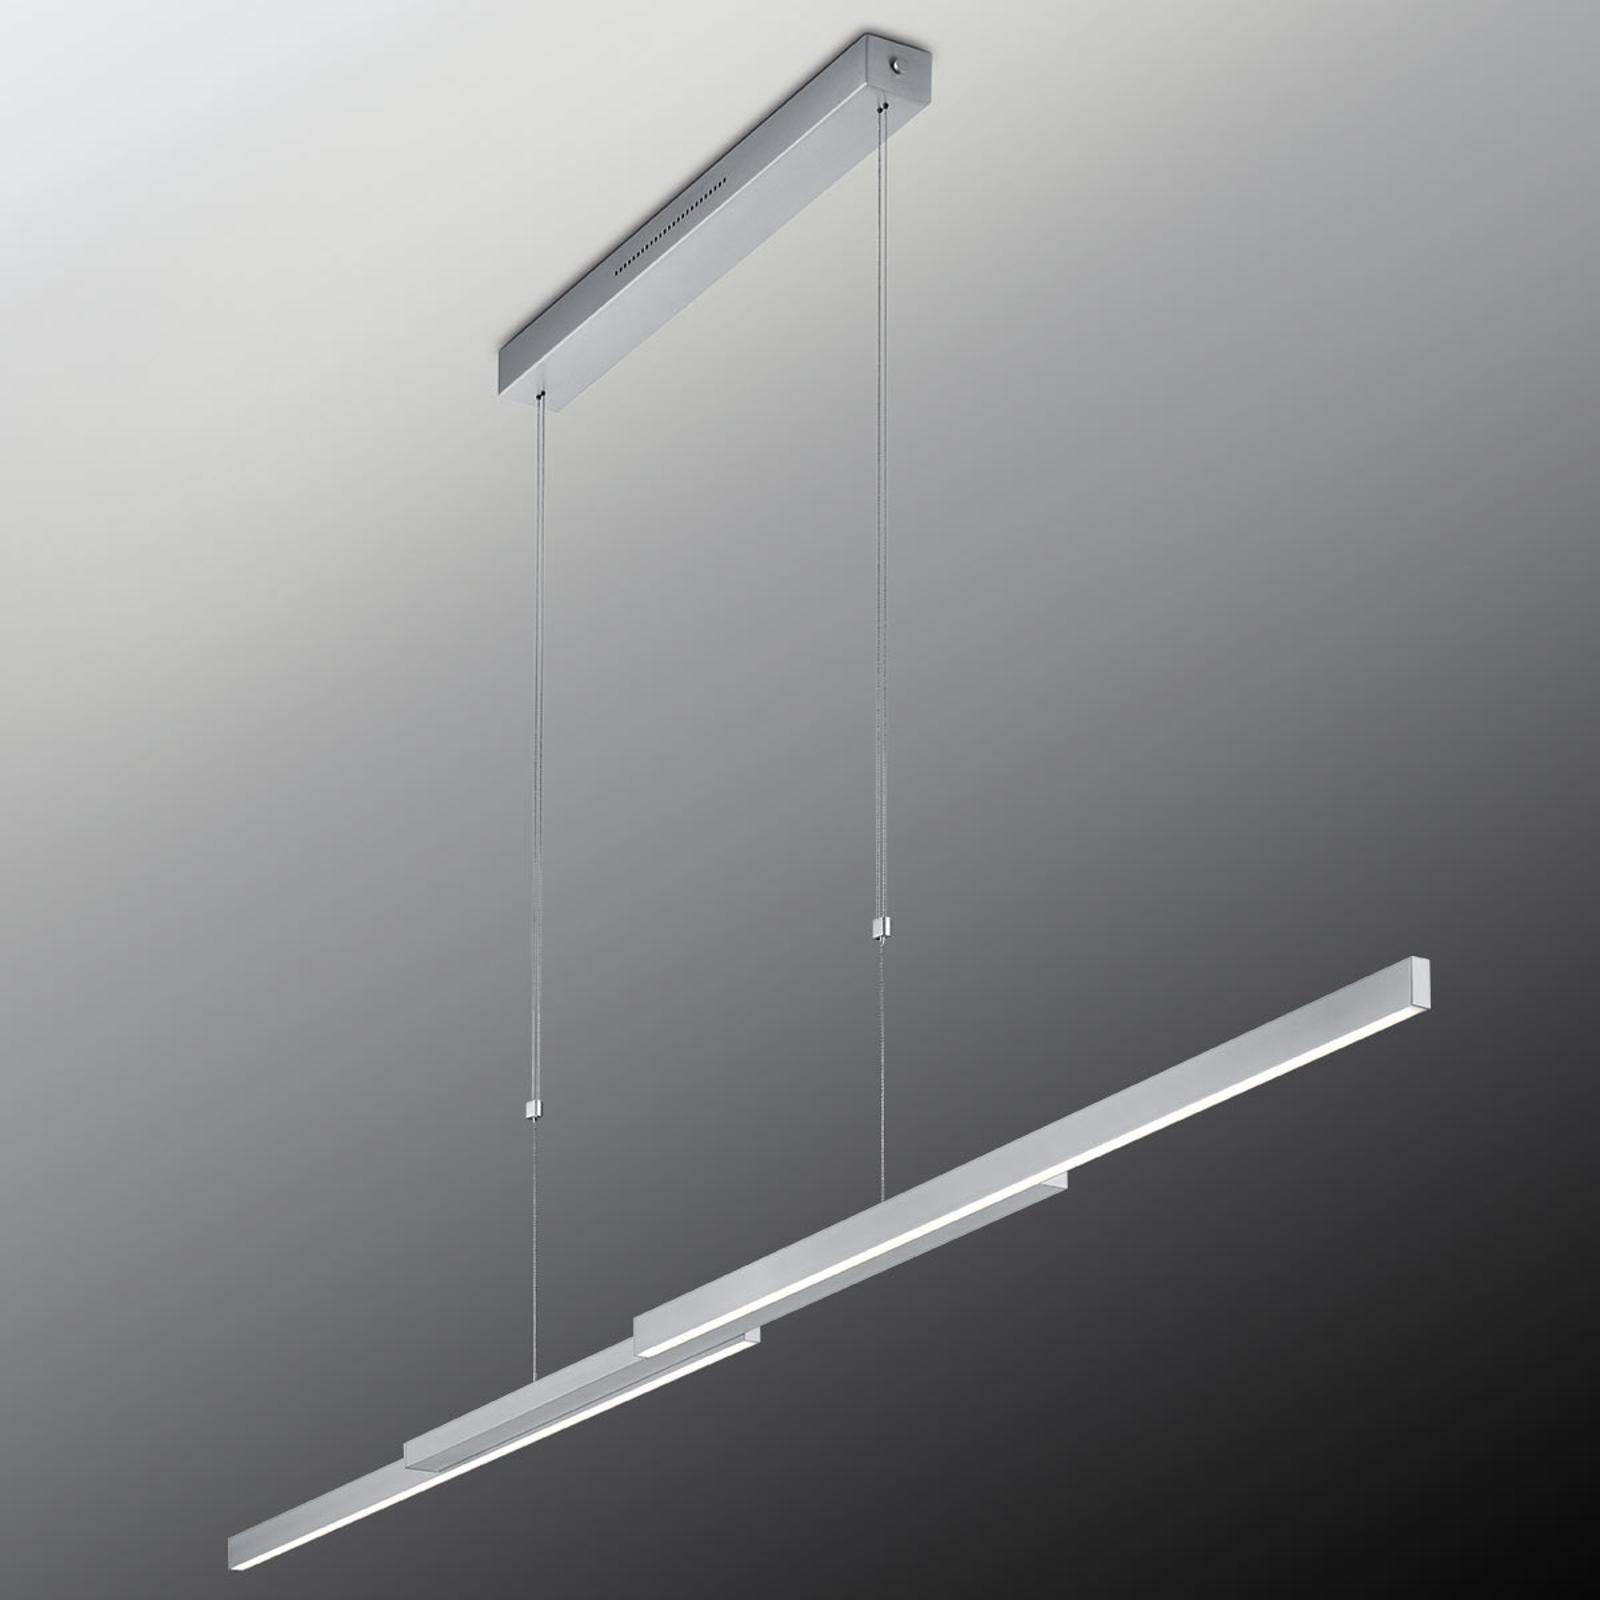 ausziehbare lampen led